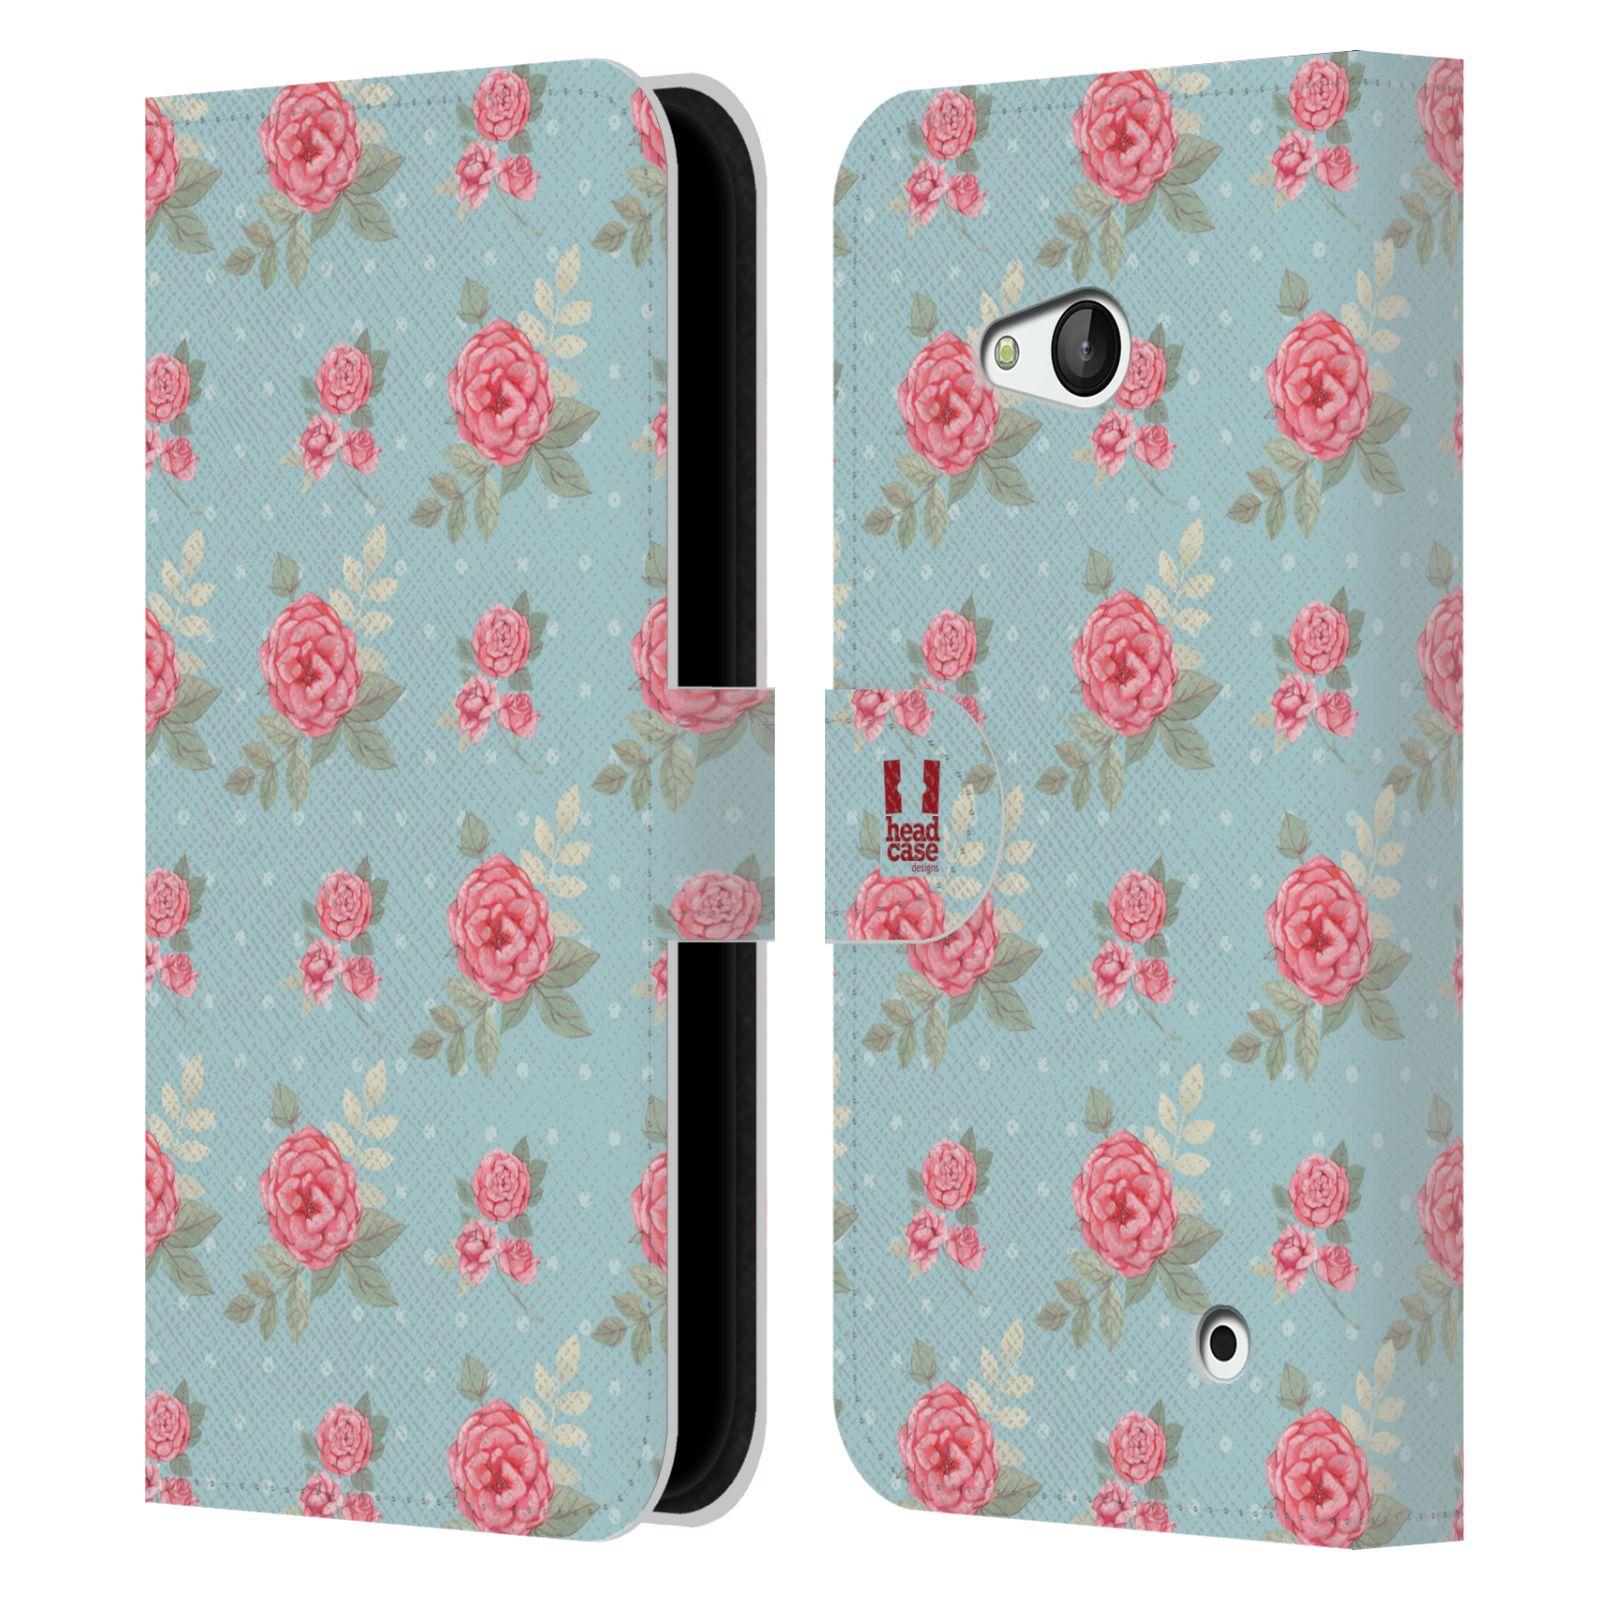 HEAD CASE Flipové pouzdro pro mobil NOKIA / MICROSOFT LUMIA 640 / LUMIA 640 DUAL romantické květy anglické růže modrá a růžová